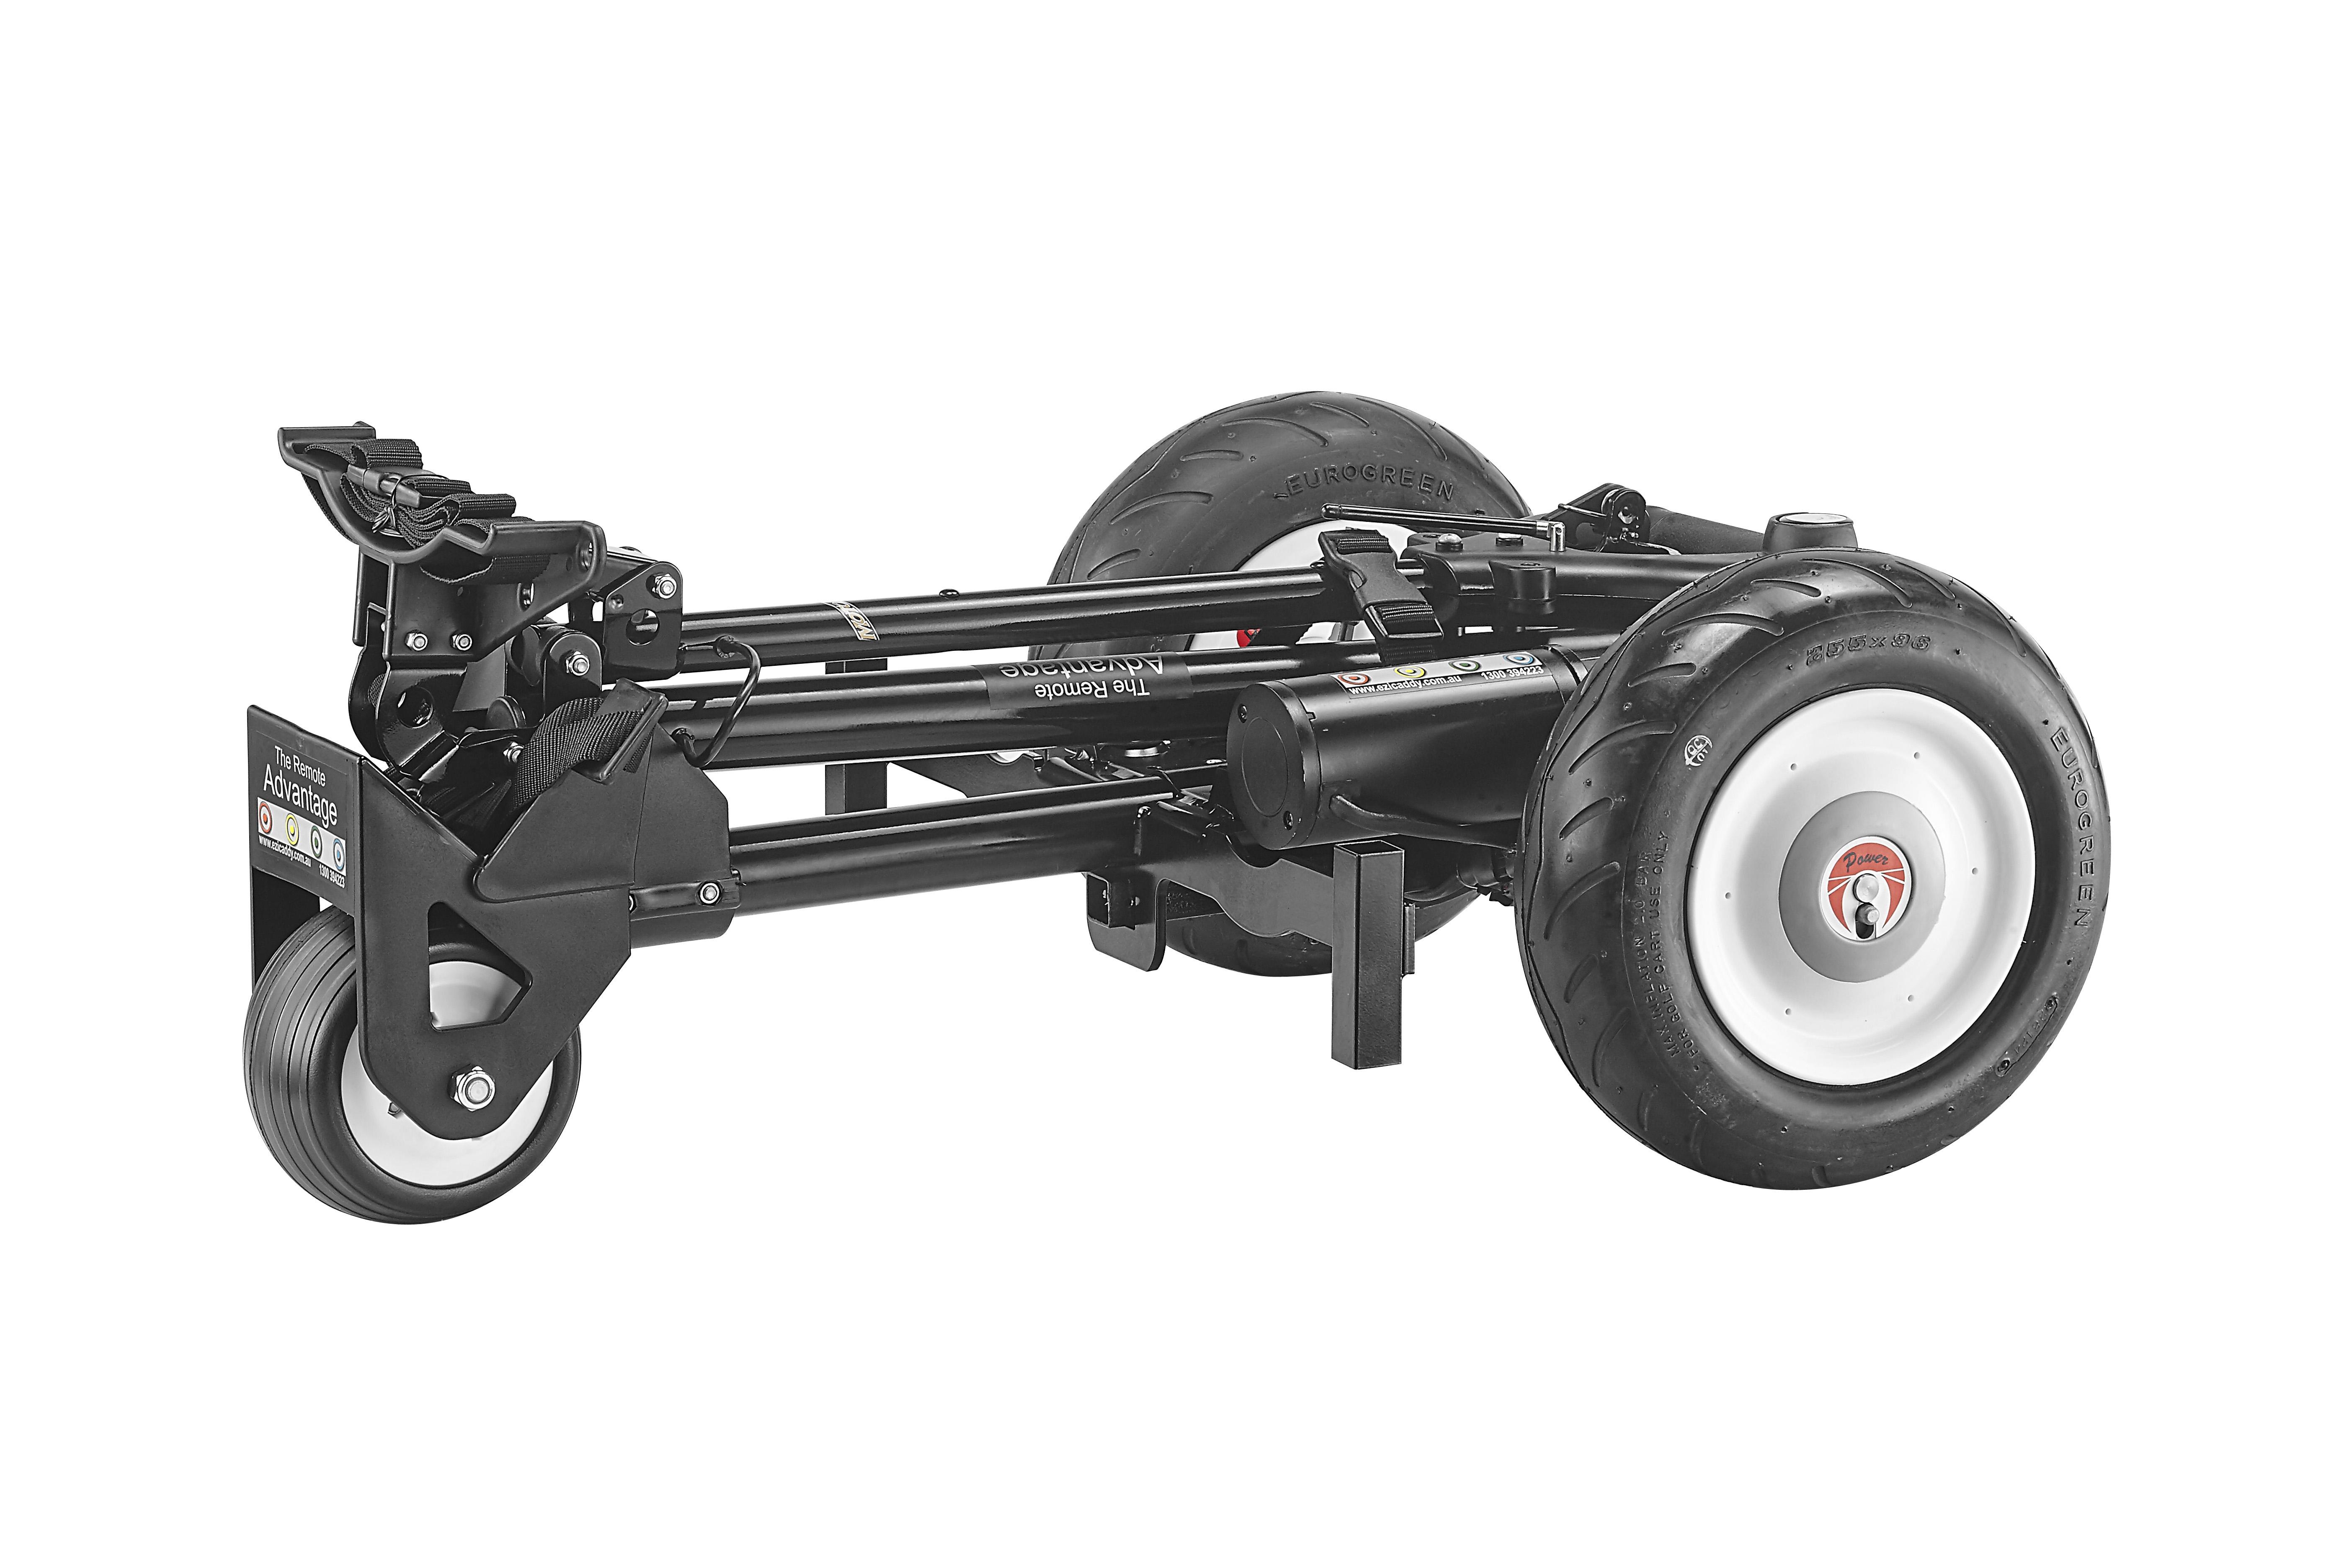 Ezicaddy Remote Advantage MotoBrake Air 18Ah Lithium, Battery Golf